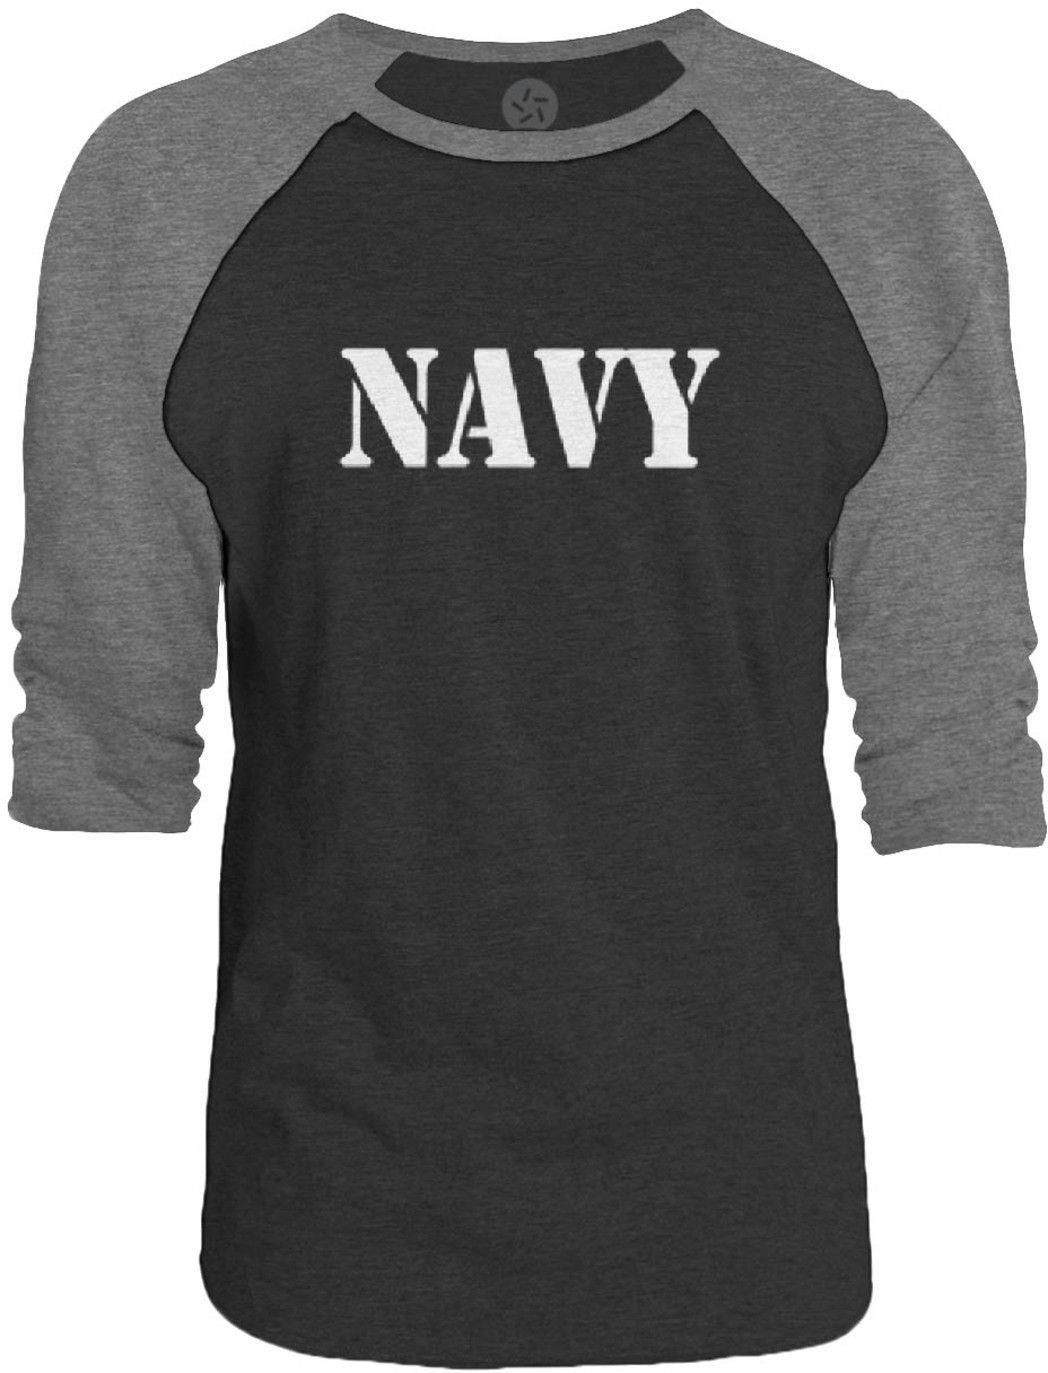 Big Texas NAVY Stencil (White) 3/4-Sleeve Raglan Baseball T-Shirt